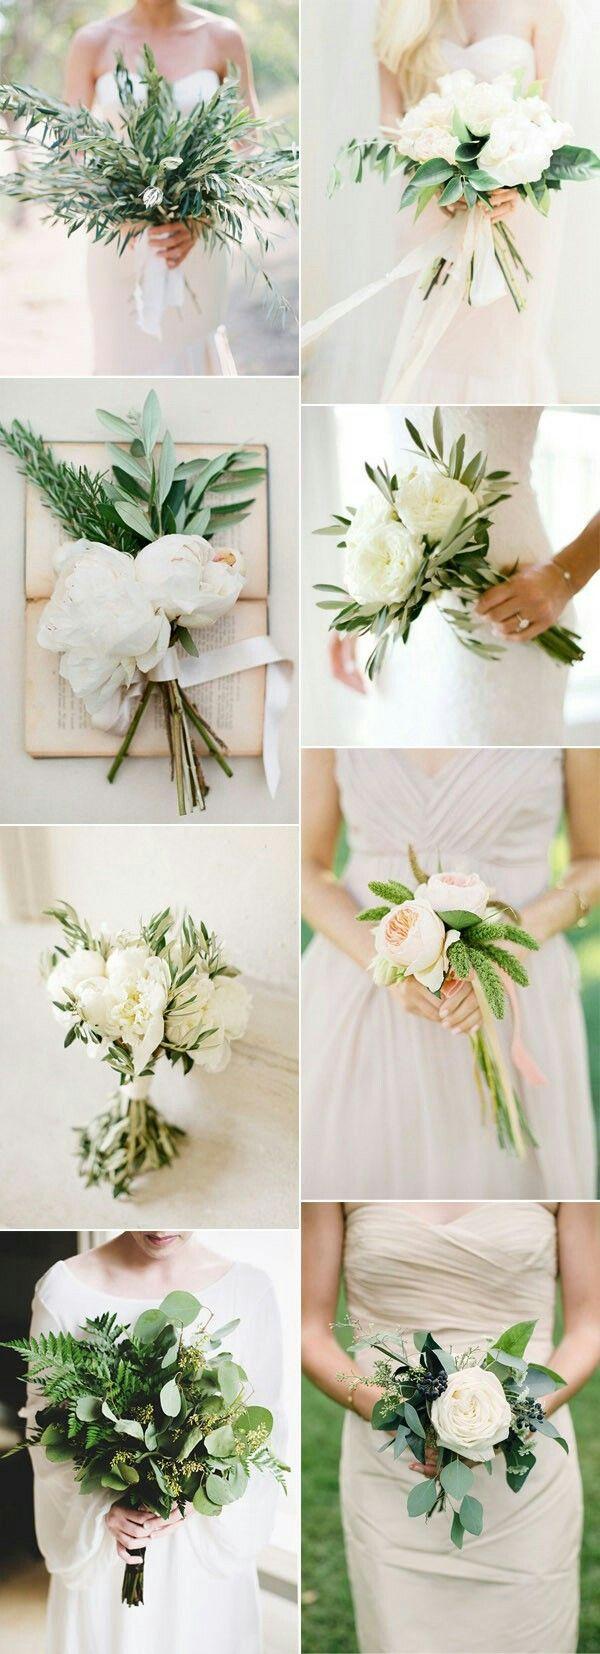 Organic Wedding Style - Brautstrauß   Wedding inspo   Pinterest ...